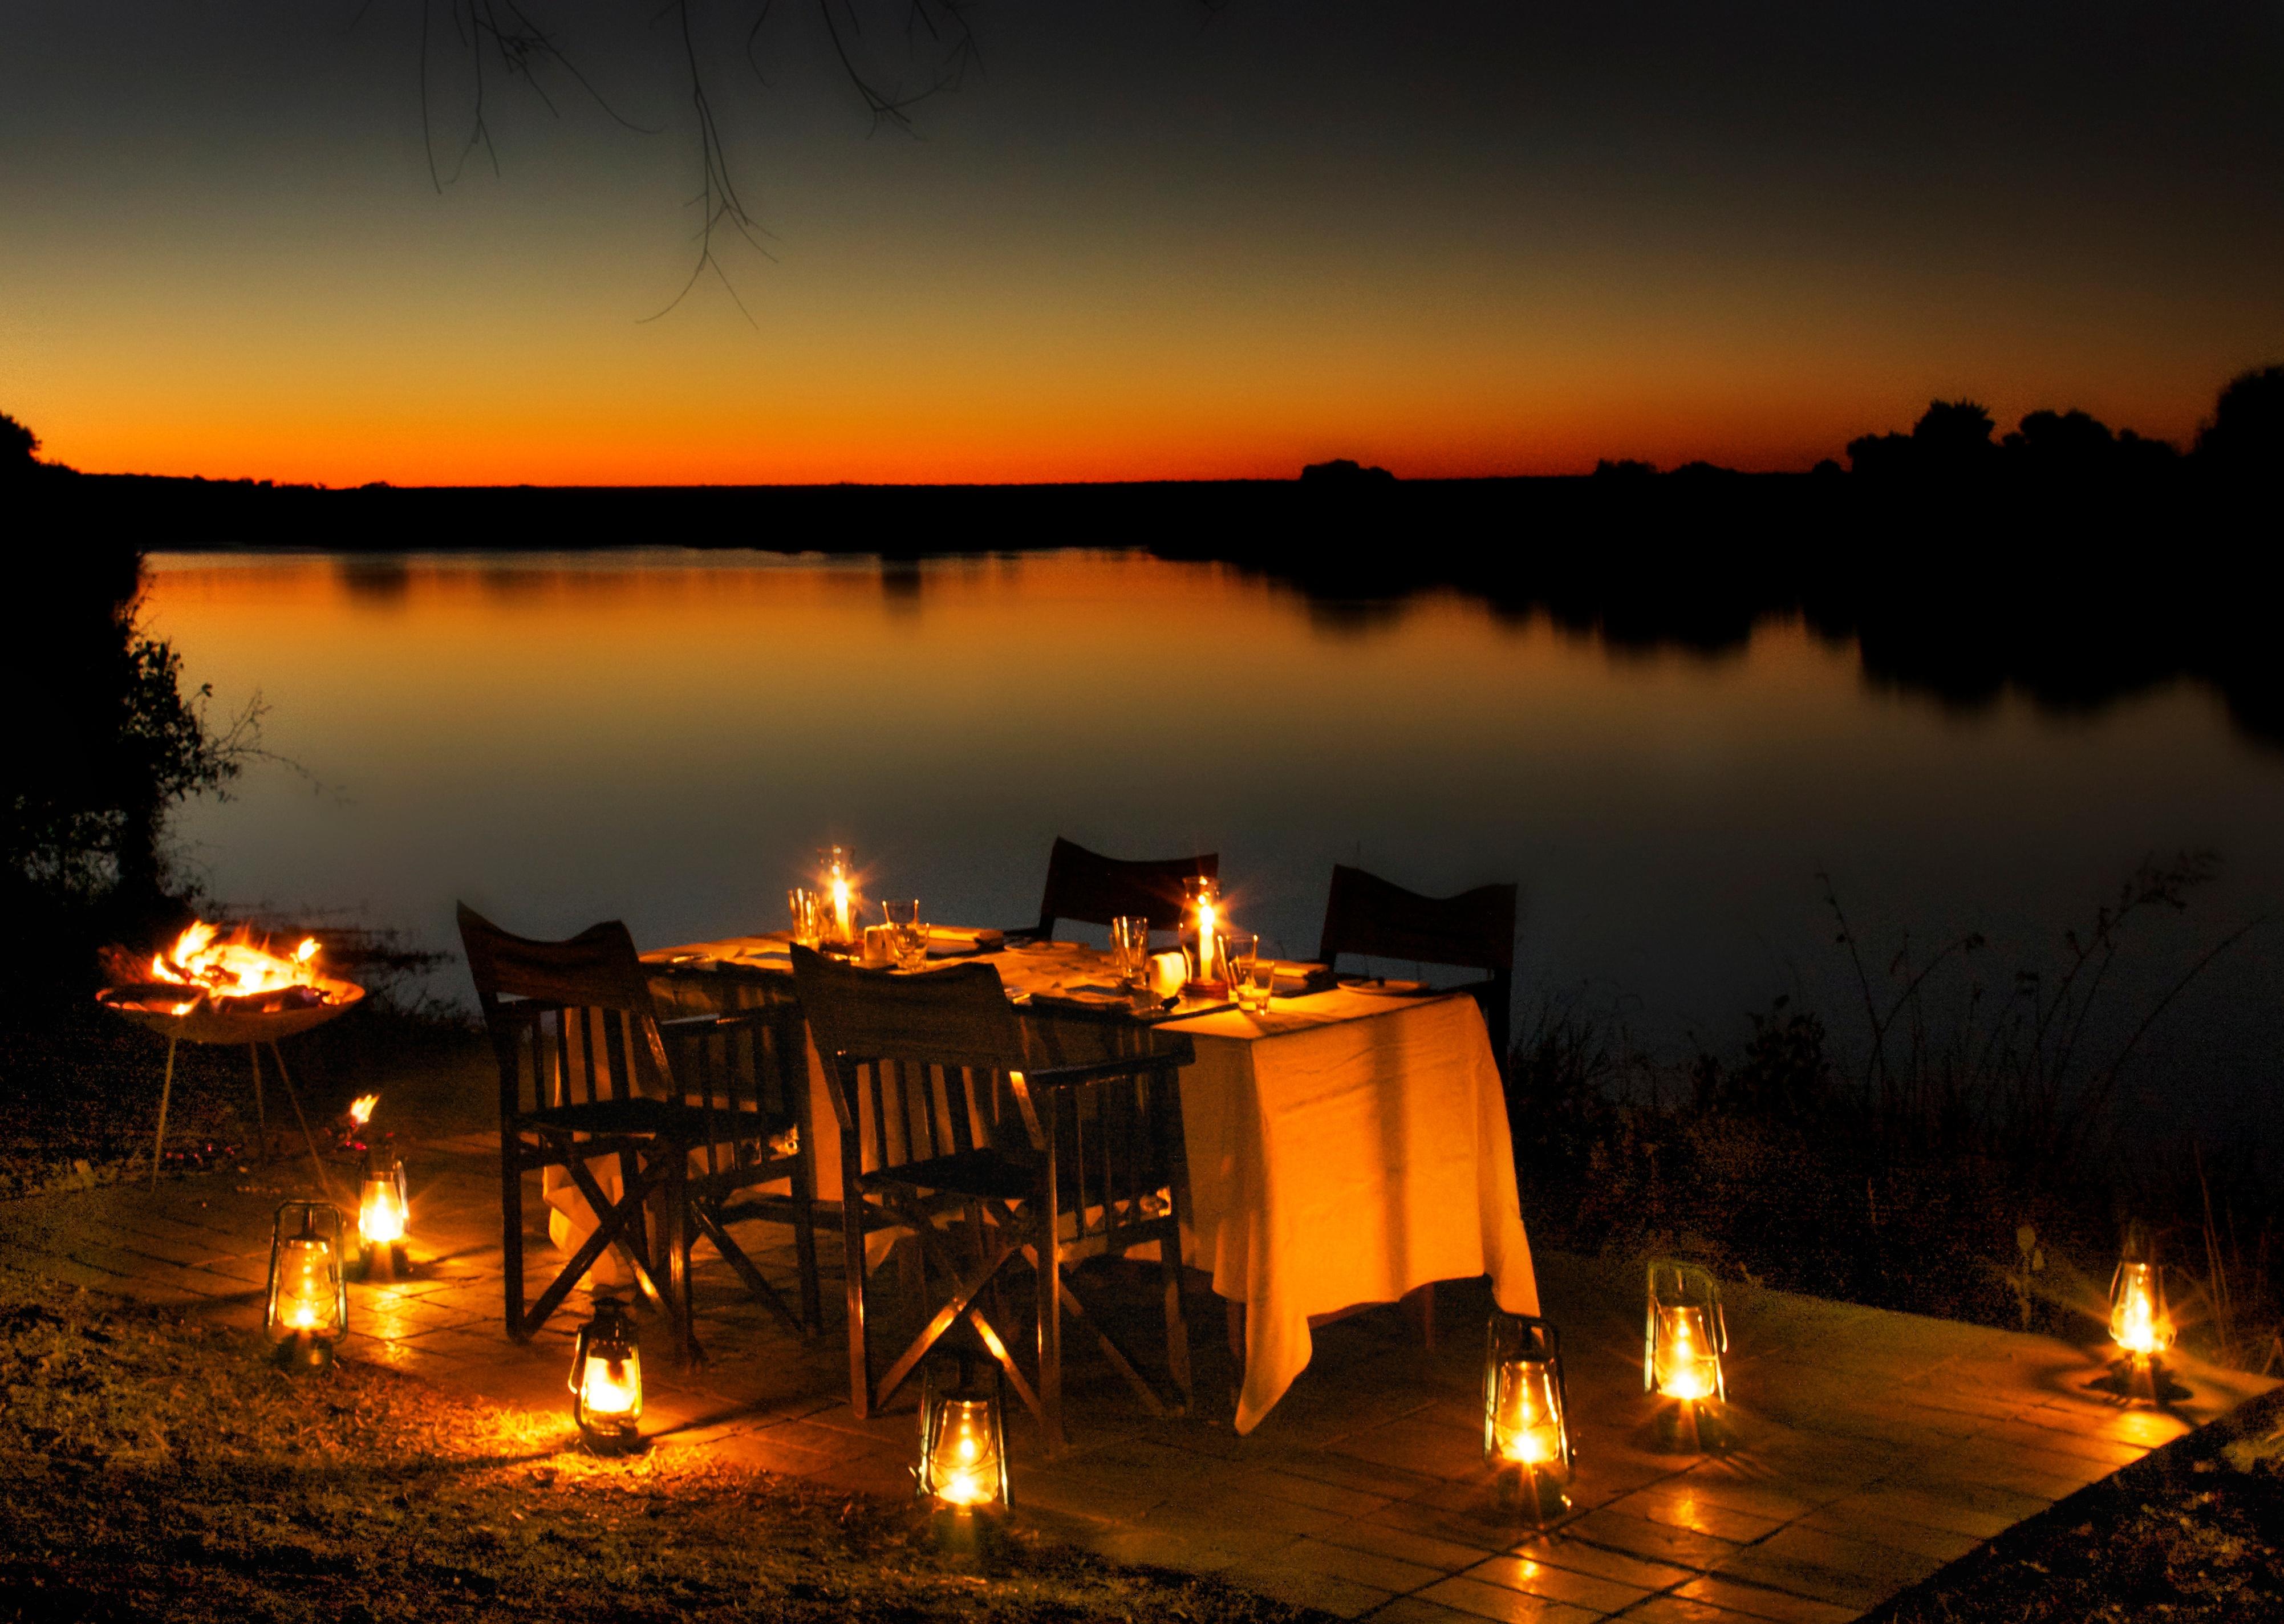 11_-Zambezi_Sands_-_Dining_on_the_river_banks.jpg